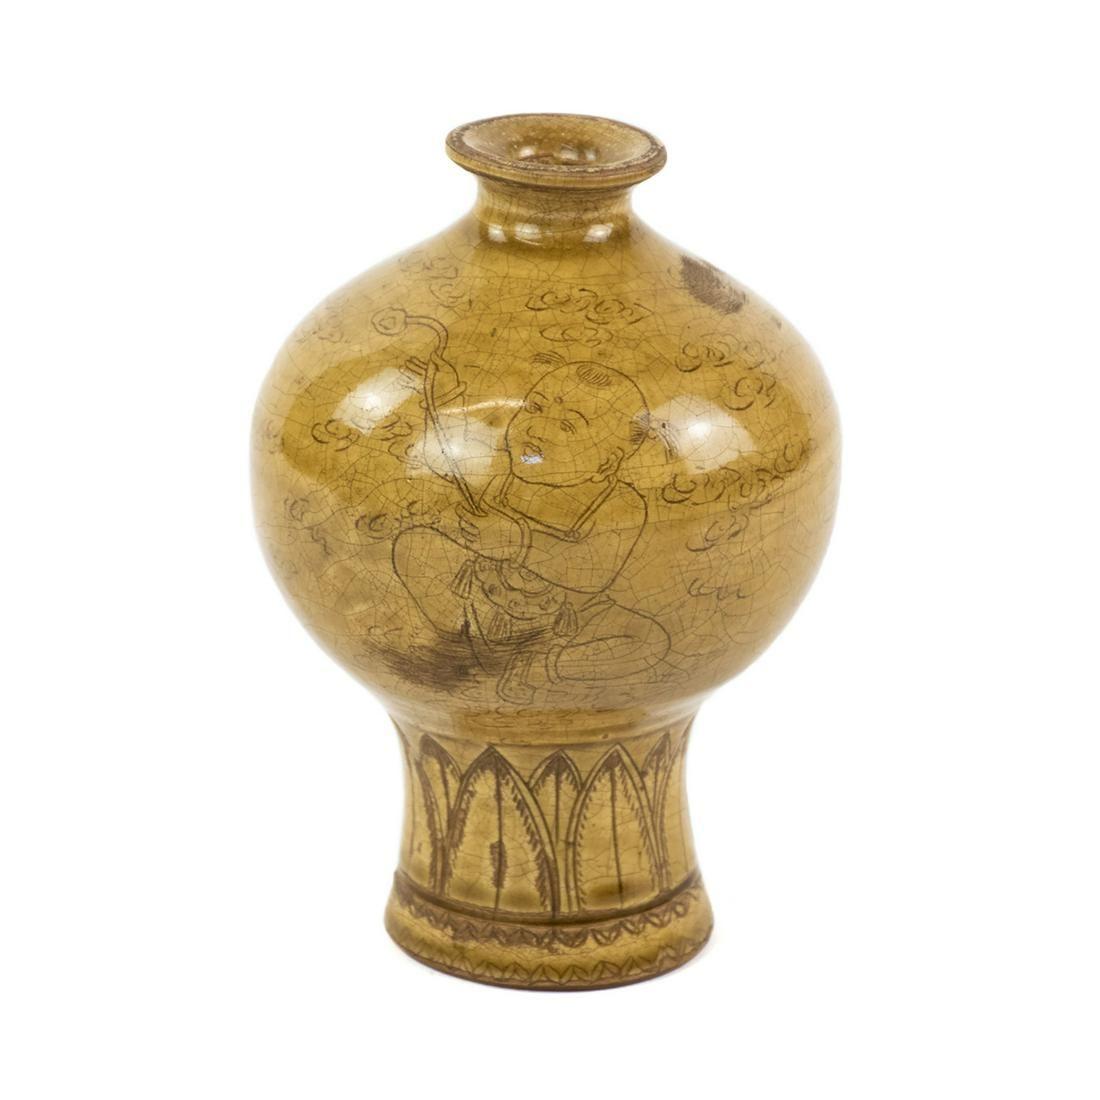 Antique Chinese Yellow Glaze Plum Vase